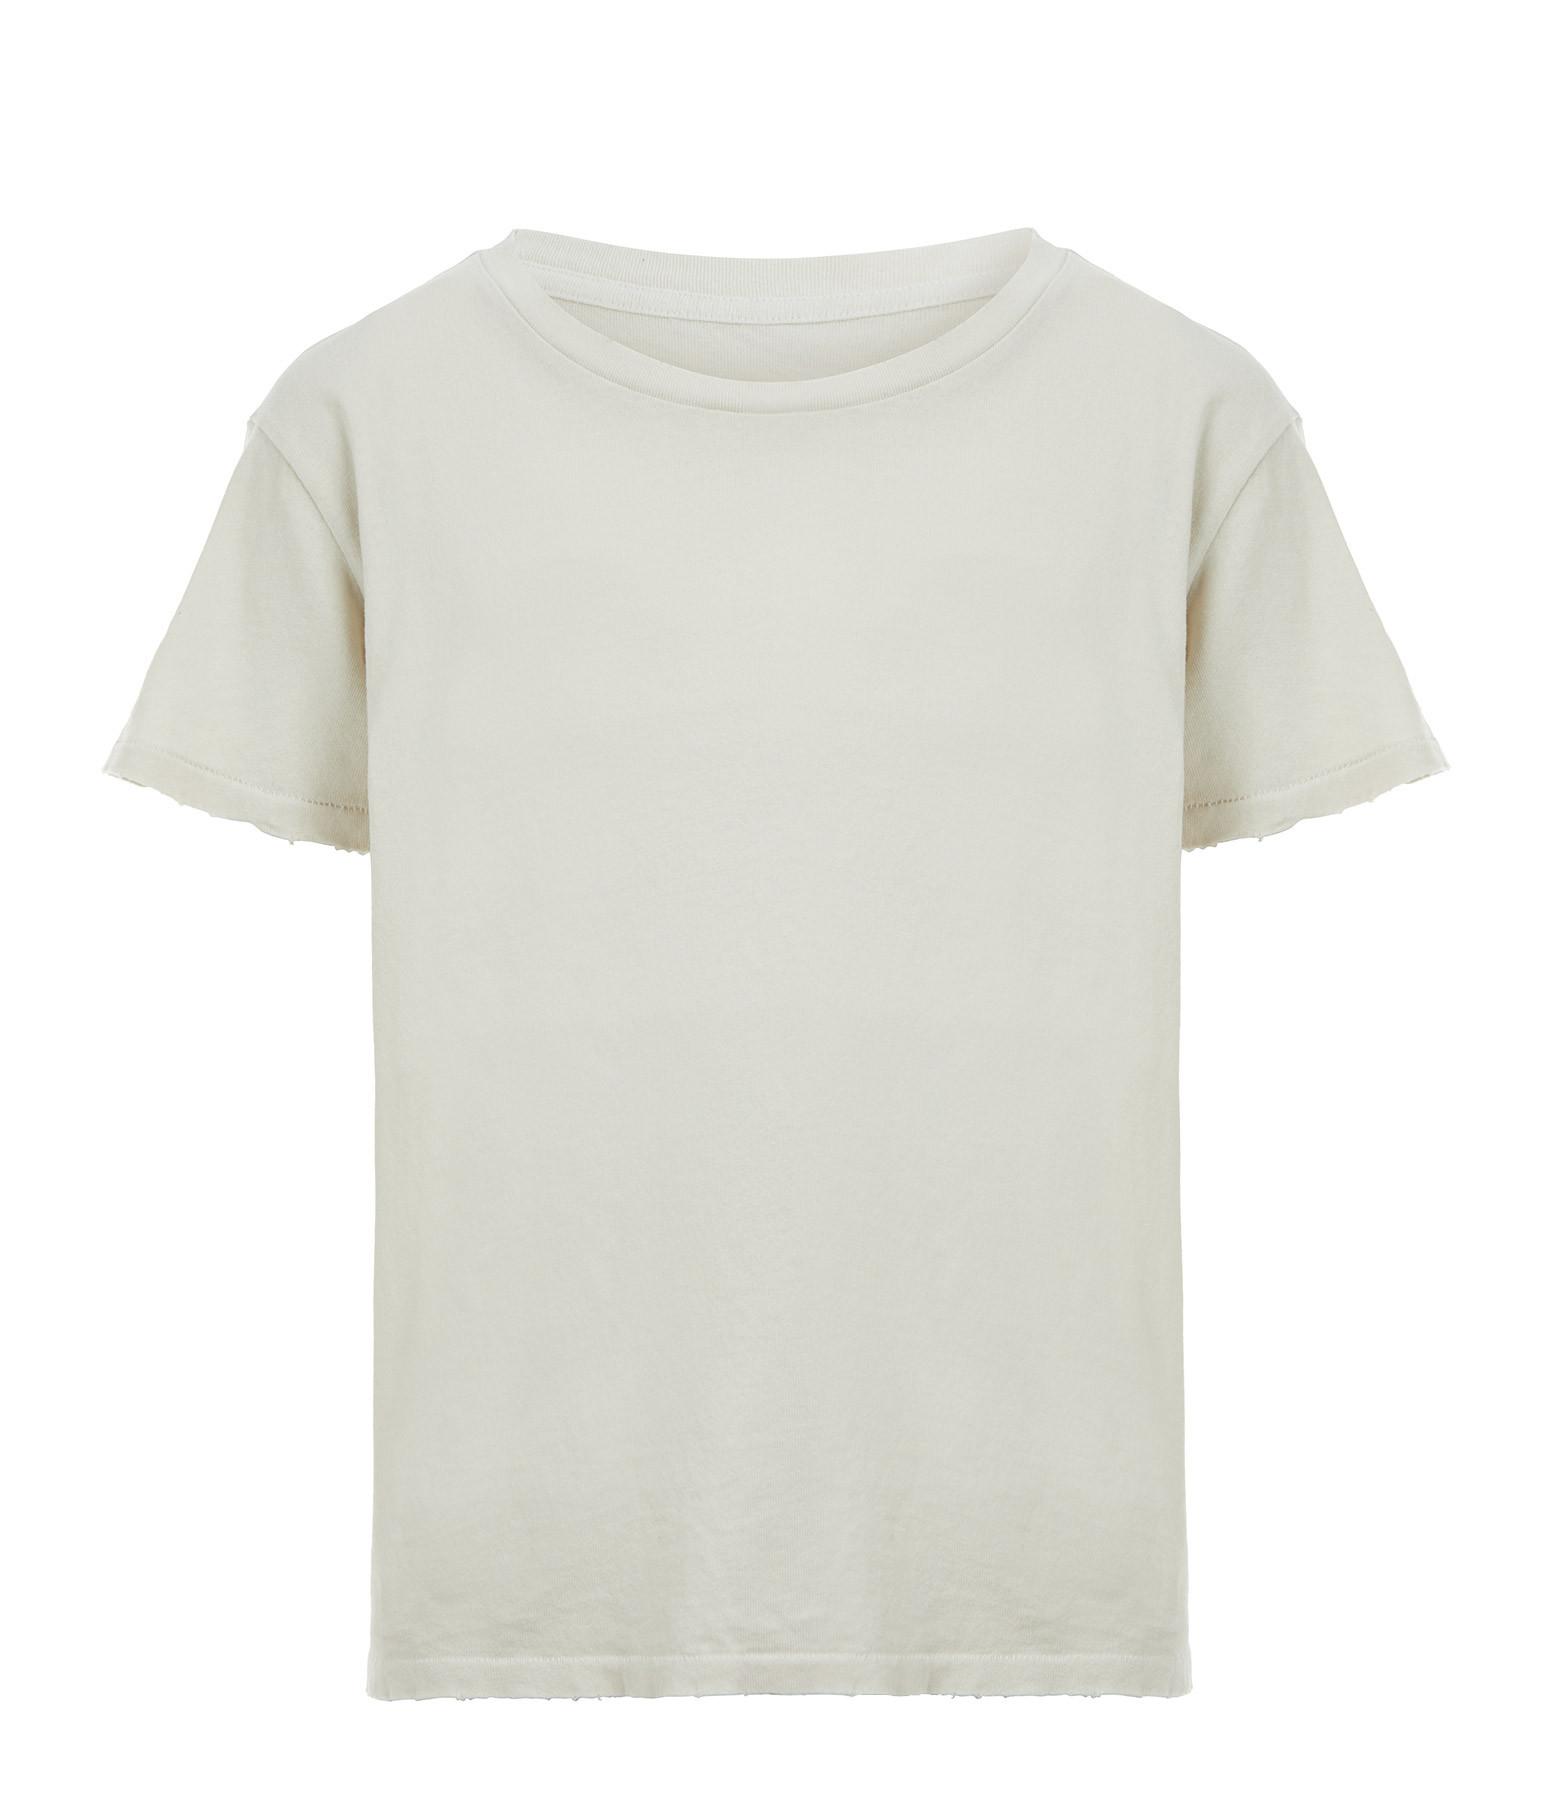 NILI LOTAN - Tee-shirt Brady Coton Craie